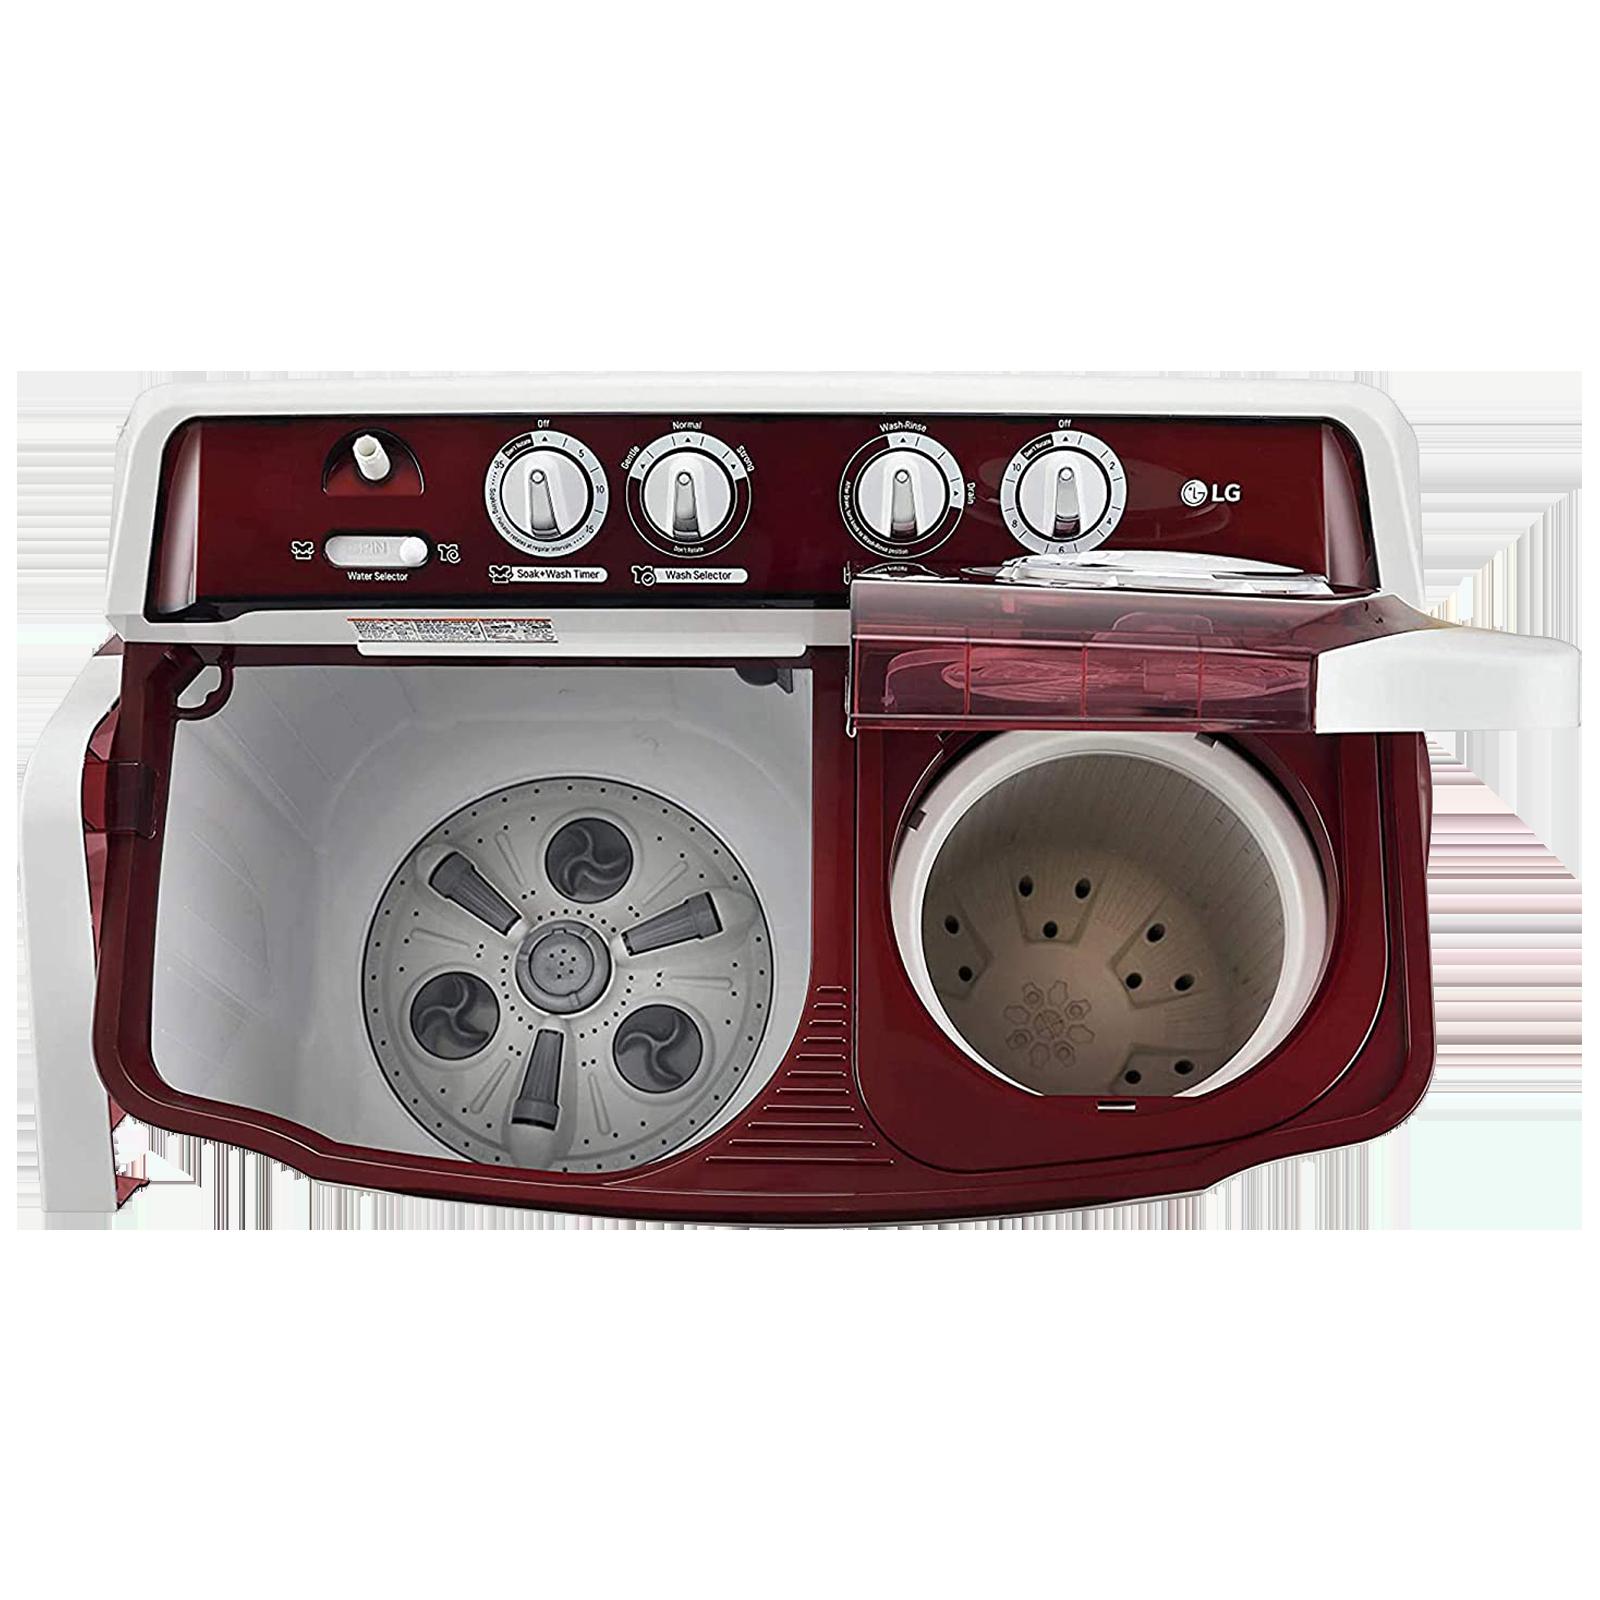 LG 8 kg 5 Star Semi-Automatic Top Load Washing Machine (Auto Restart, P8035SRMZ.ABGQEIL, Burgundy)_4